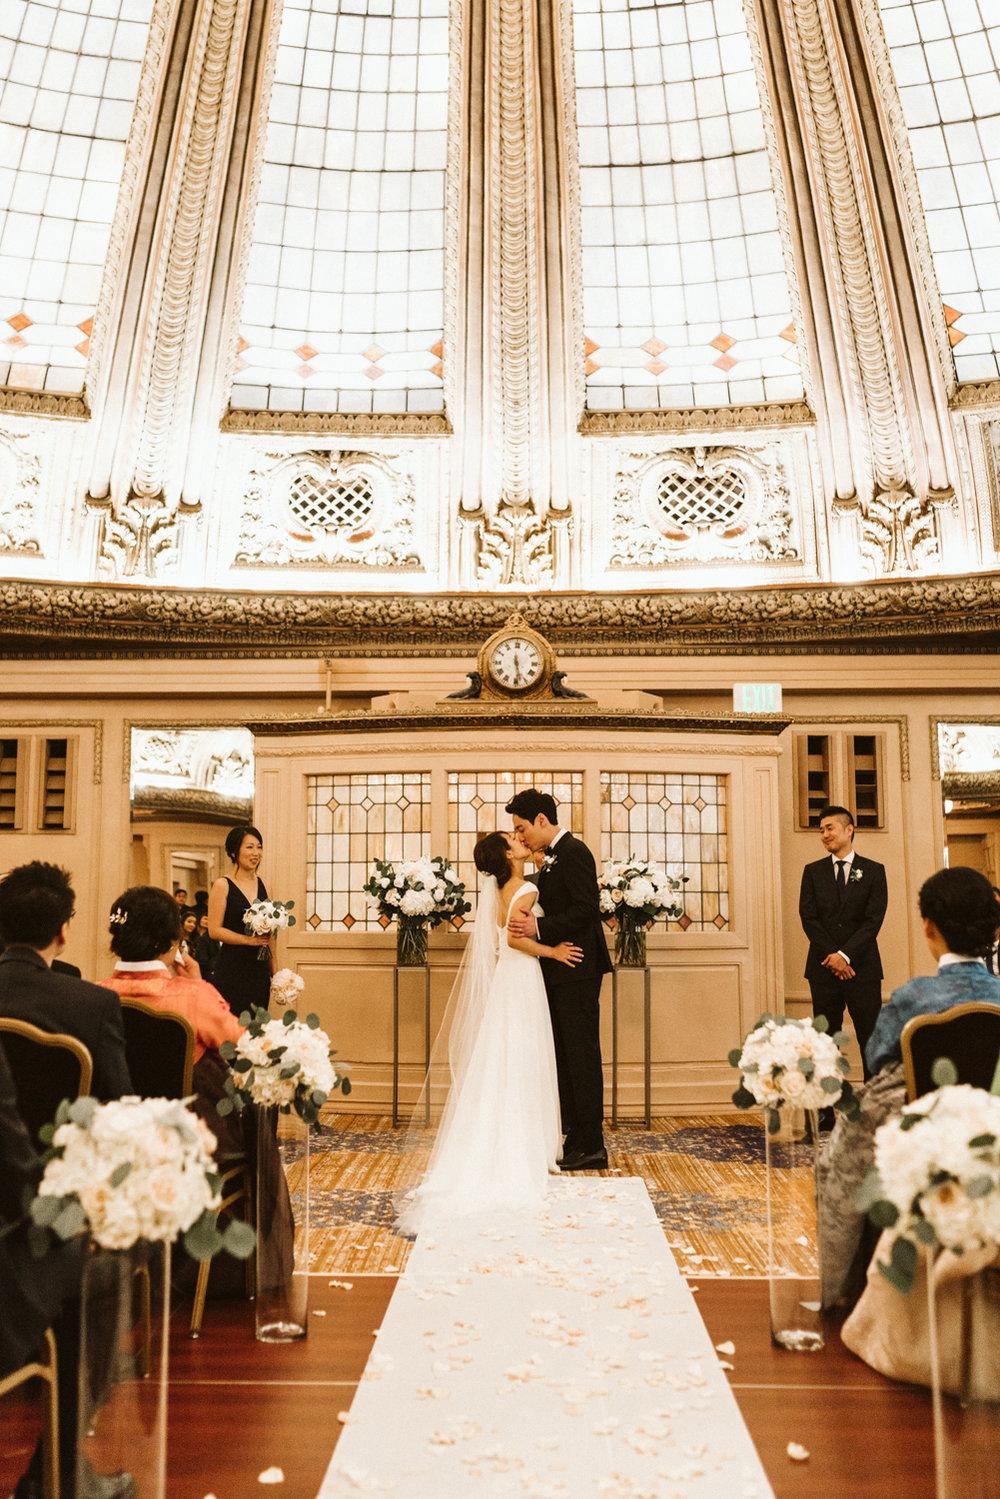 April Yentas Photography - Kristen & Jeff Wedding-29.jpg